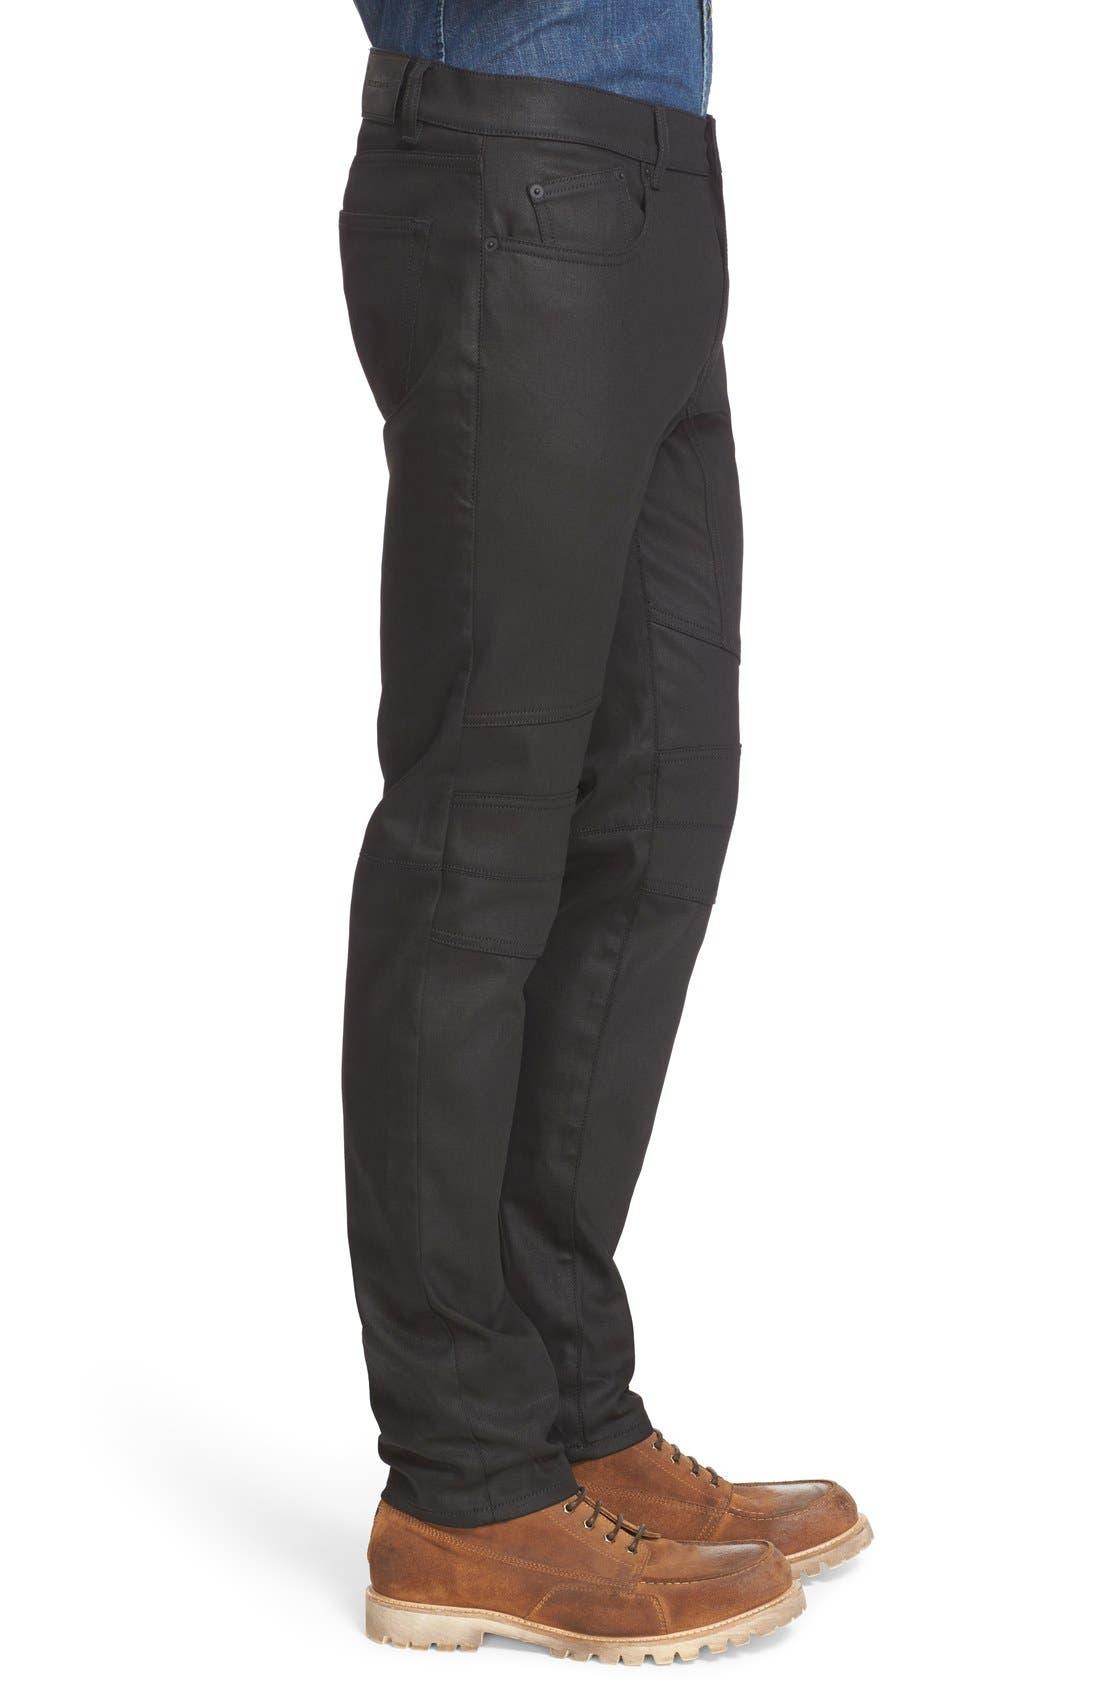 Westham Raw Stretch Denim Moto Jeans,                             Alternate thumbnail 6, color,                             001